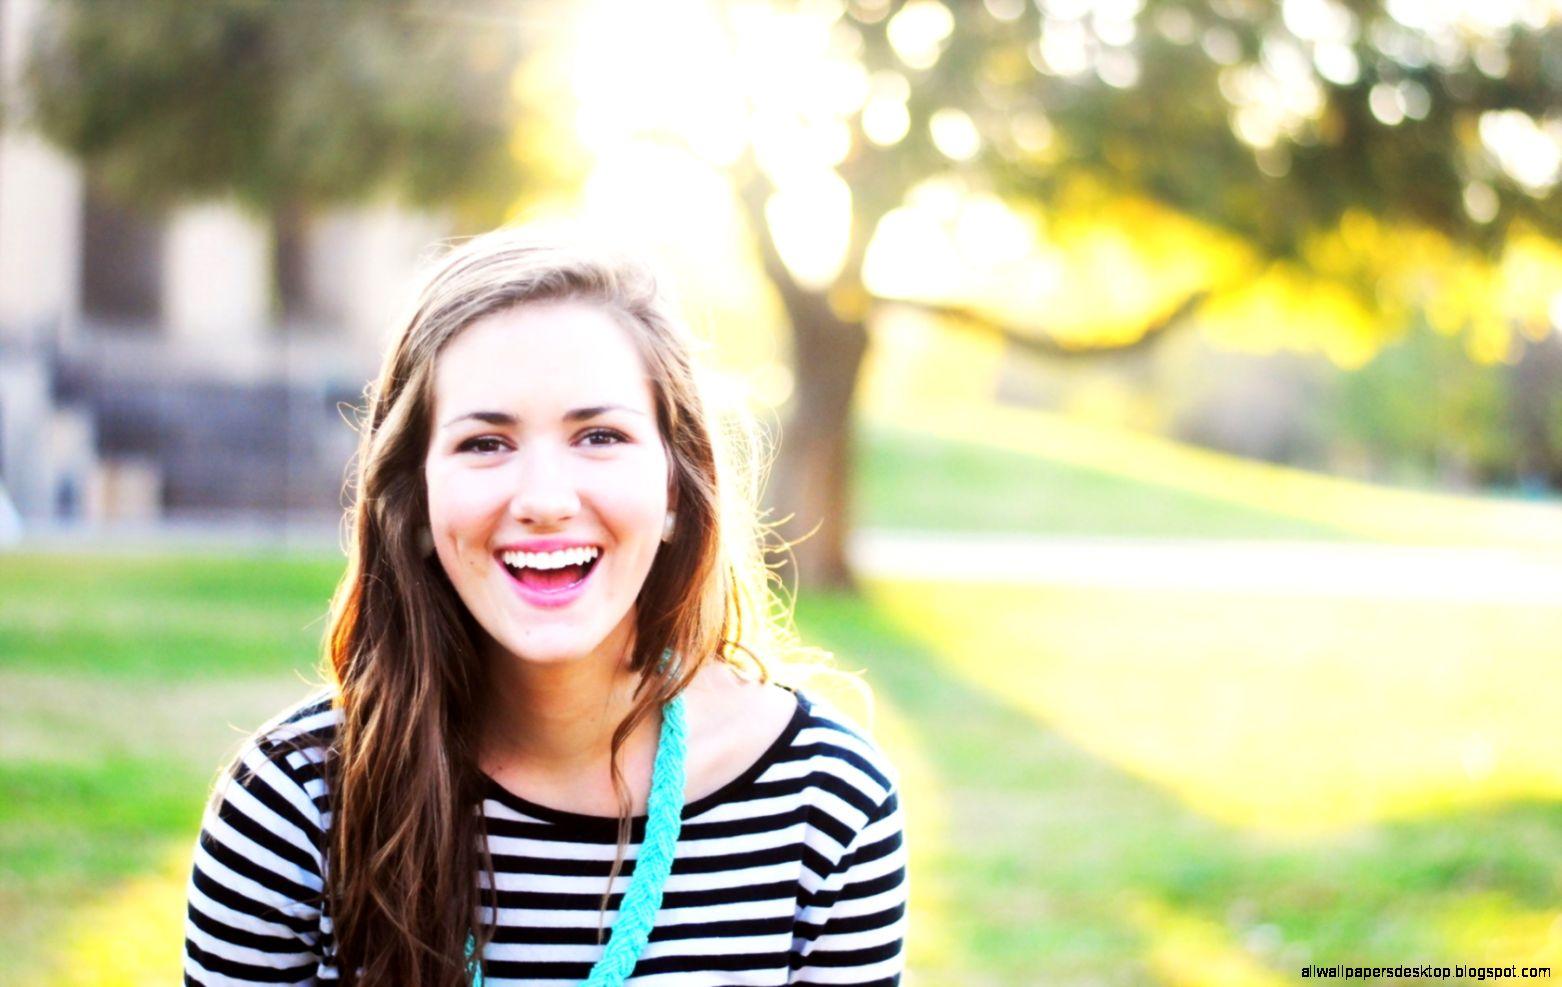 Smile Girl Portrait Mood Wallpaper Size 1680x1050  AmazingPict